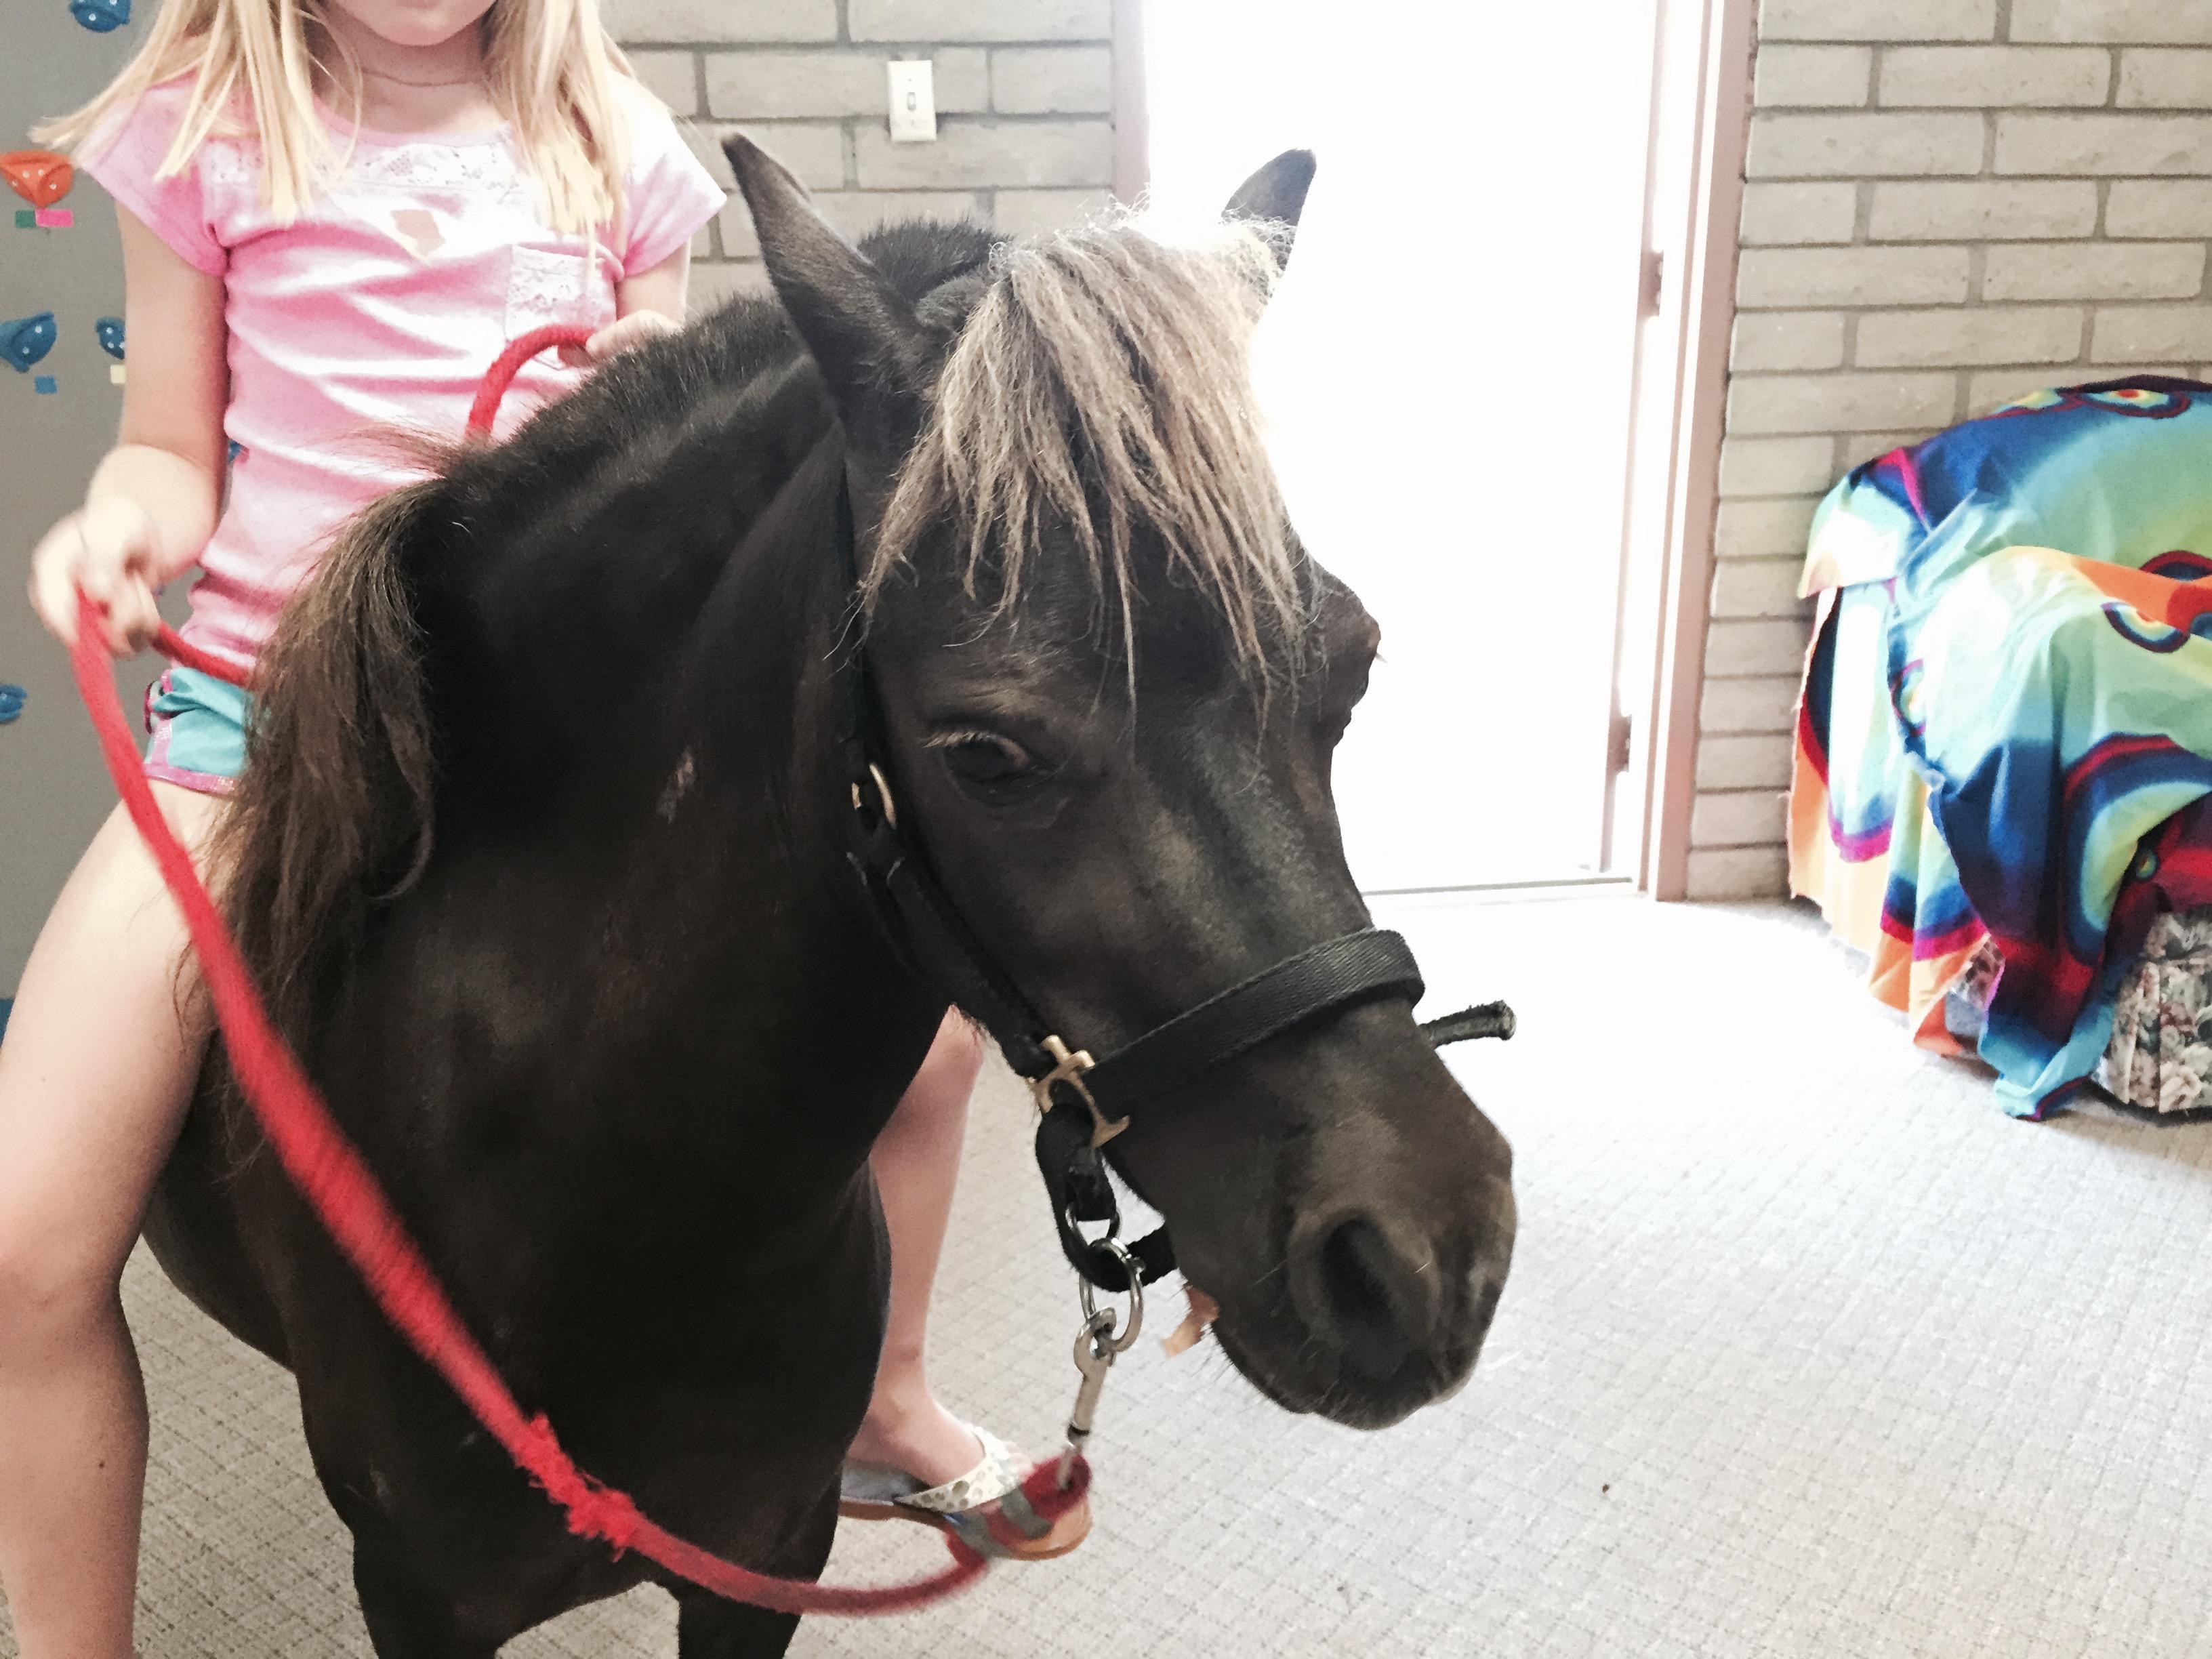 Kid riding a pony